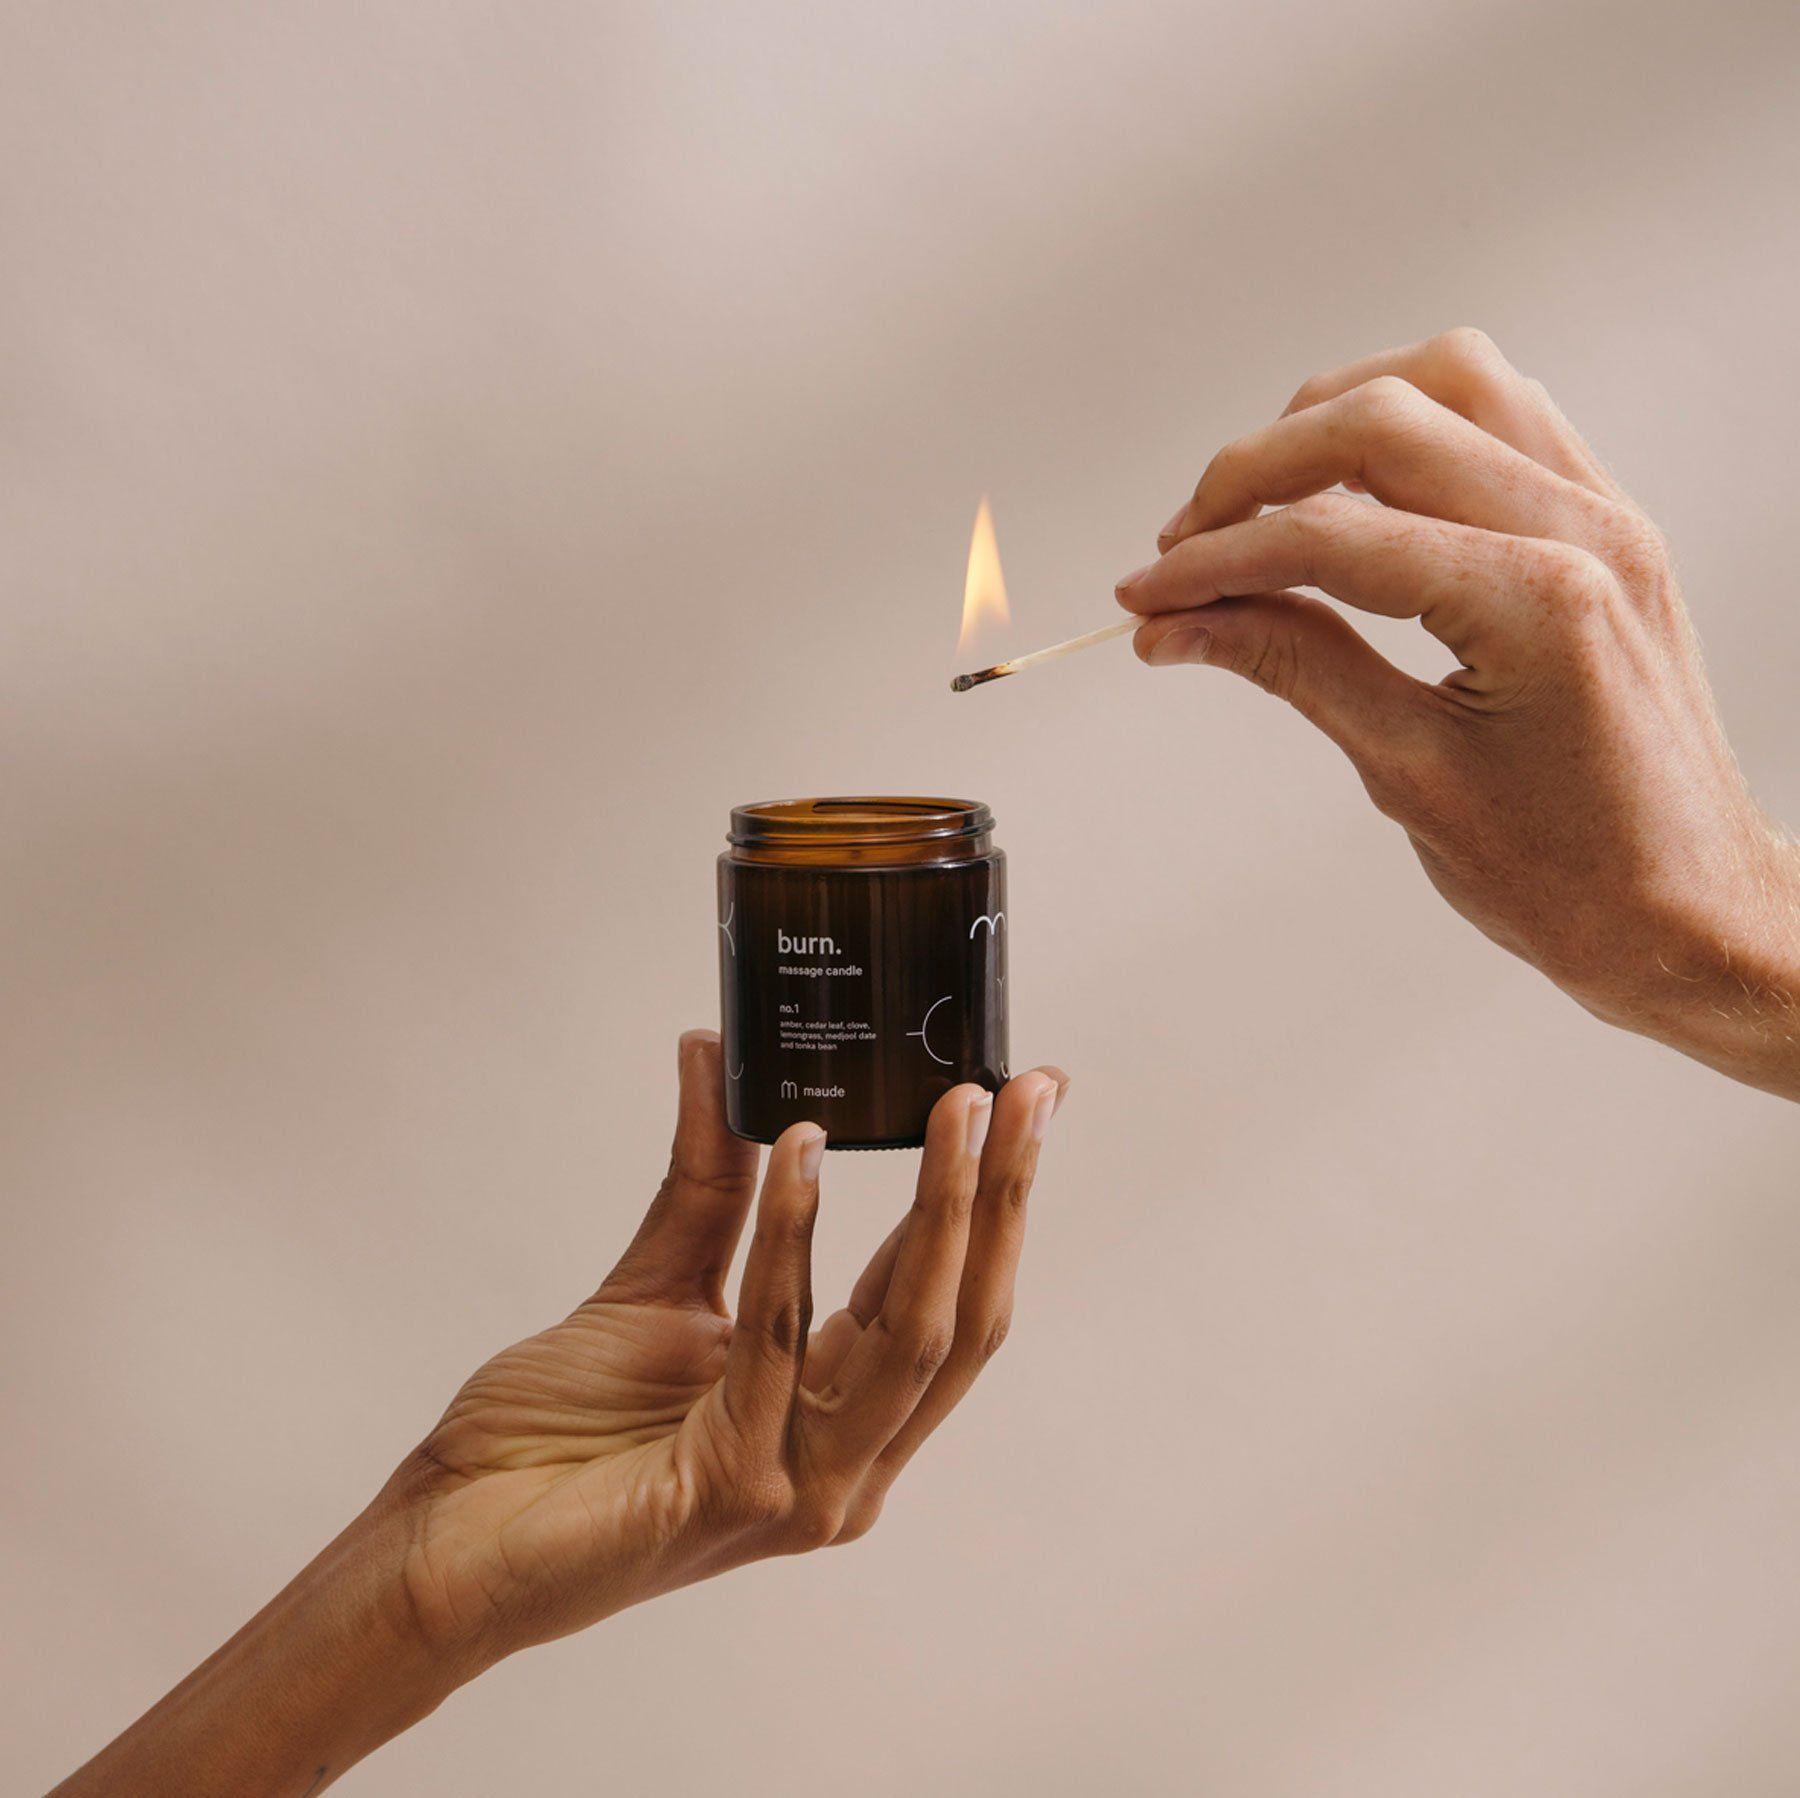 Burn No 1 Body Care Skin Care